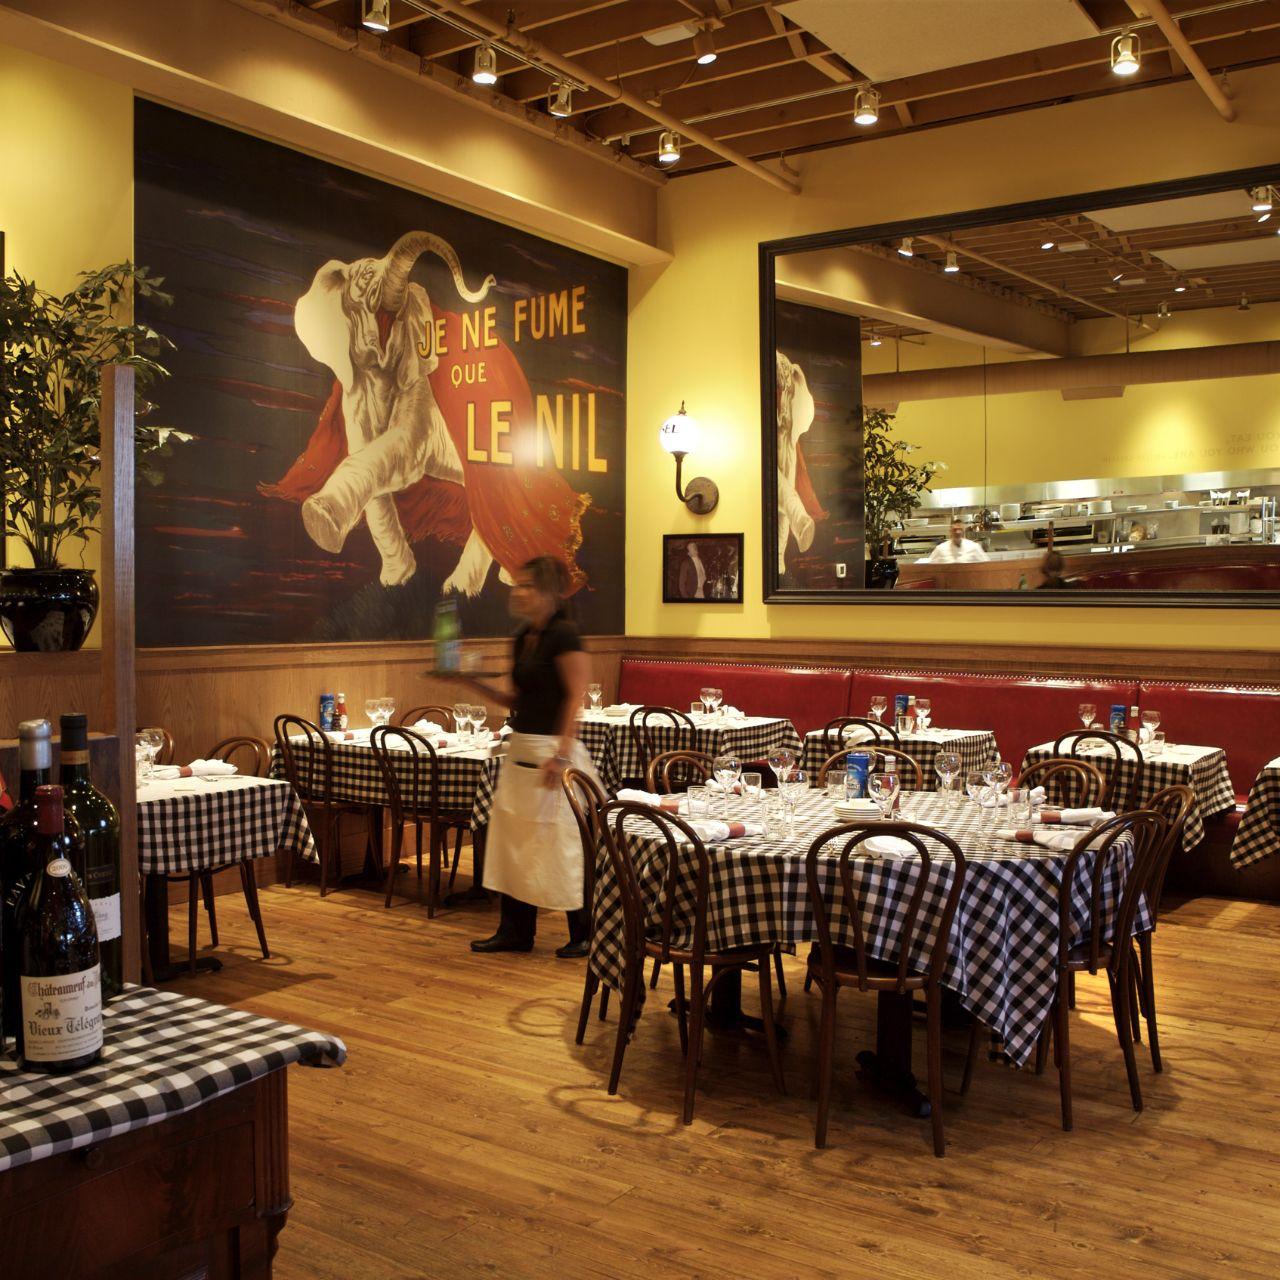 Dressing À L Américaine salut bar americain - edina restaurant - edina, mn | opentable